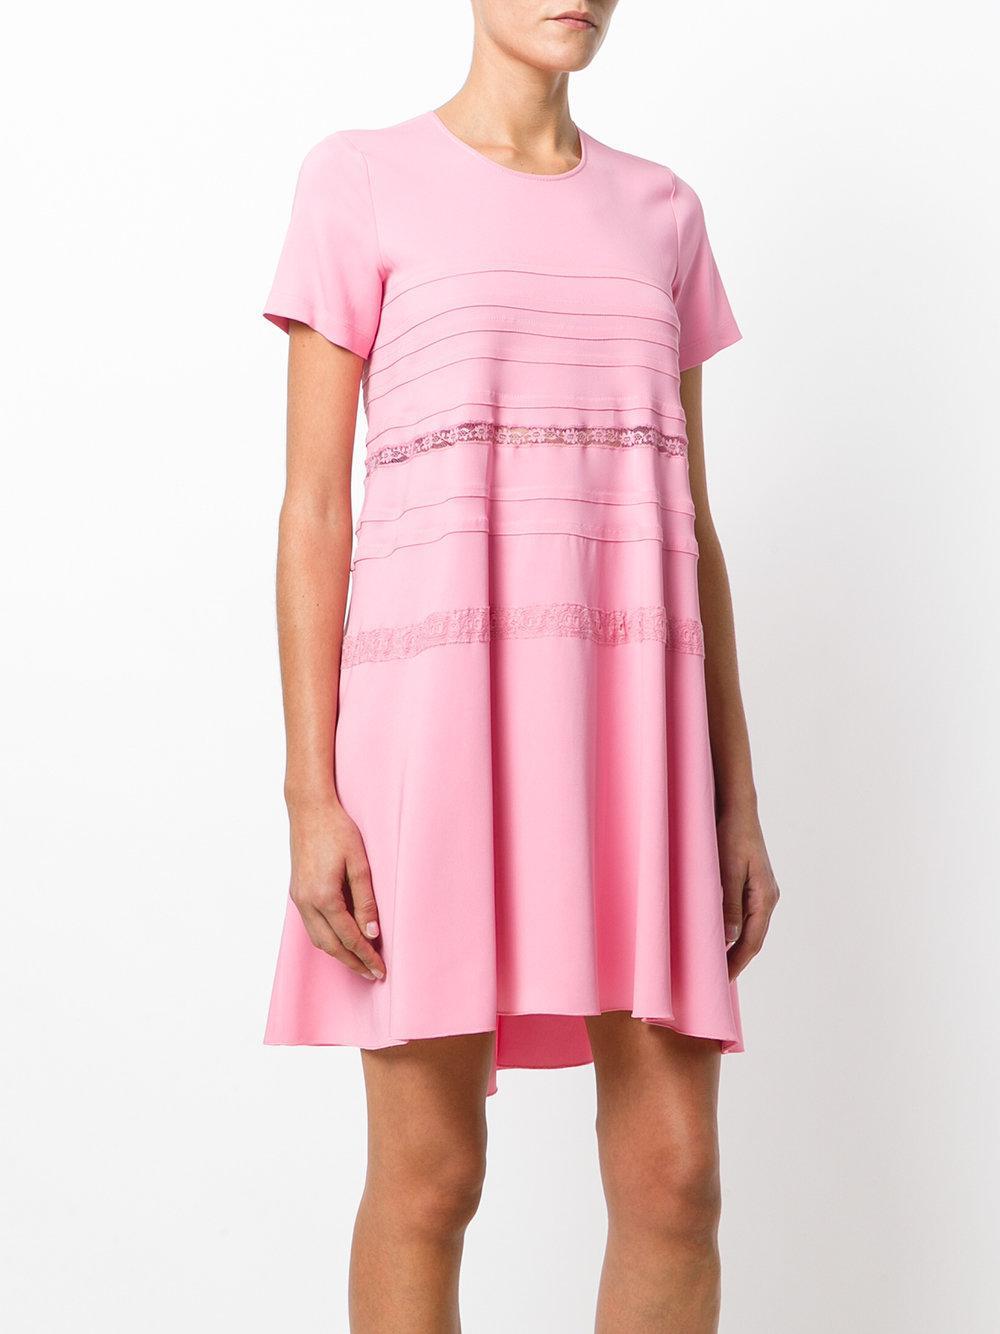 sheer waist dress - Pink & Purple N jz5Jom